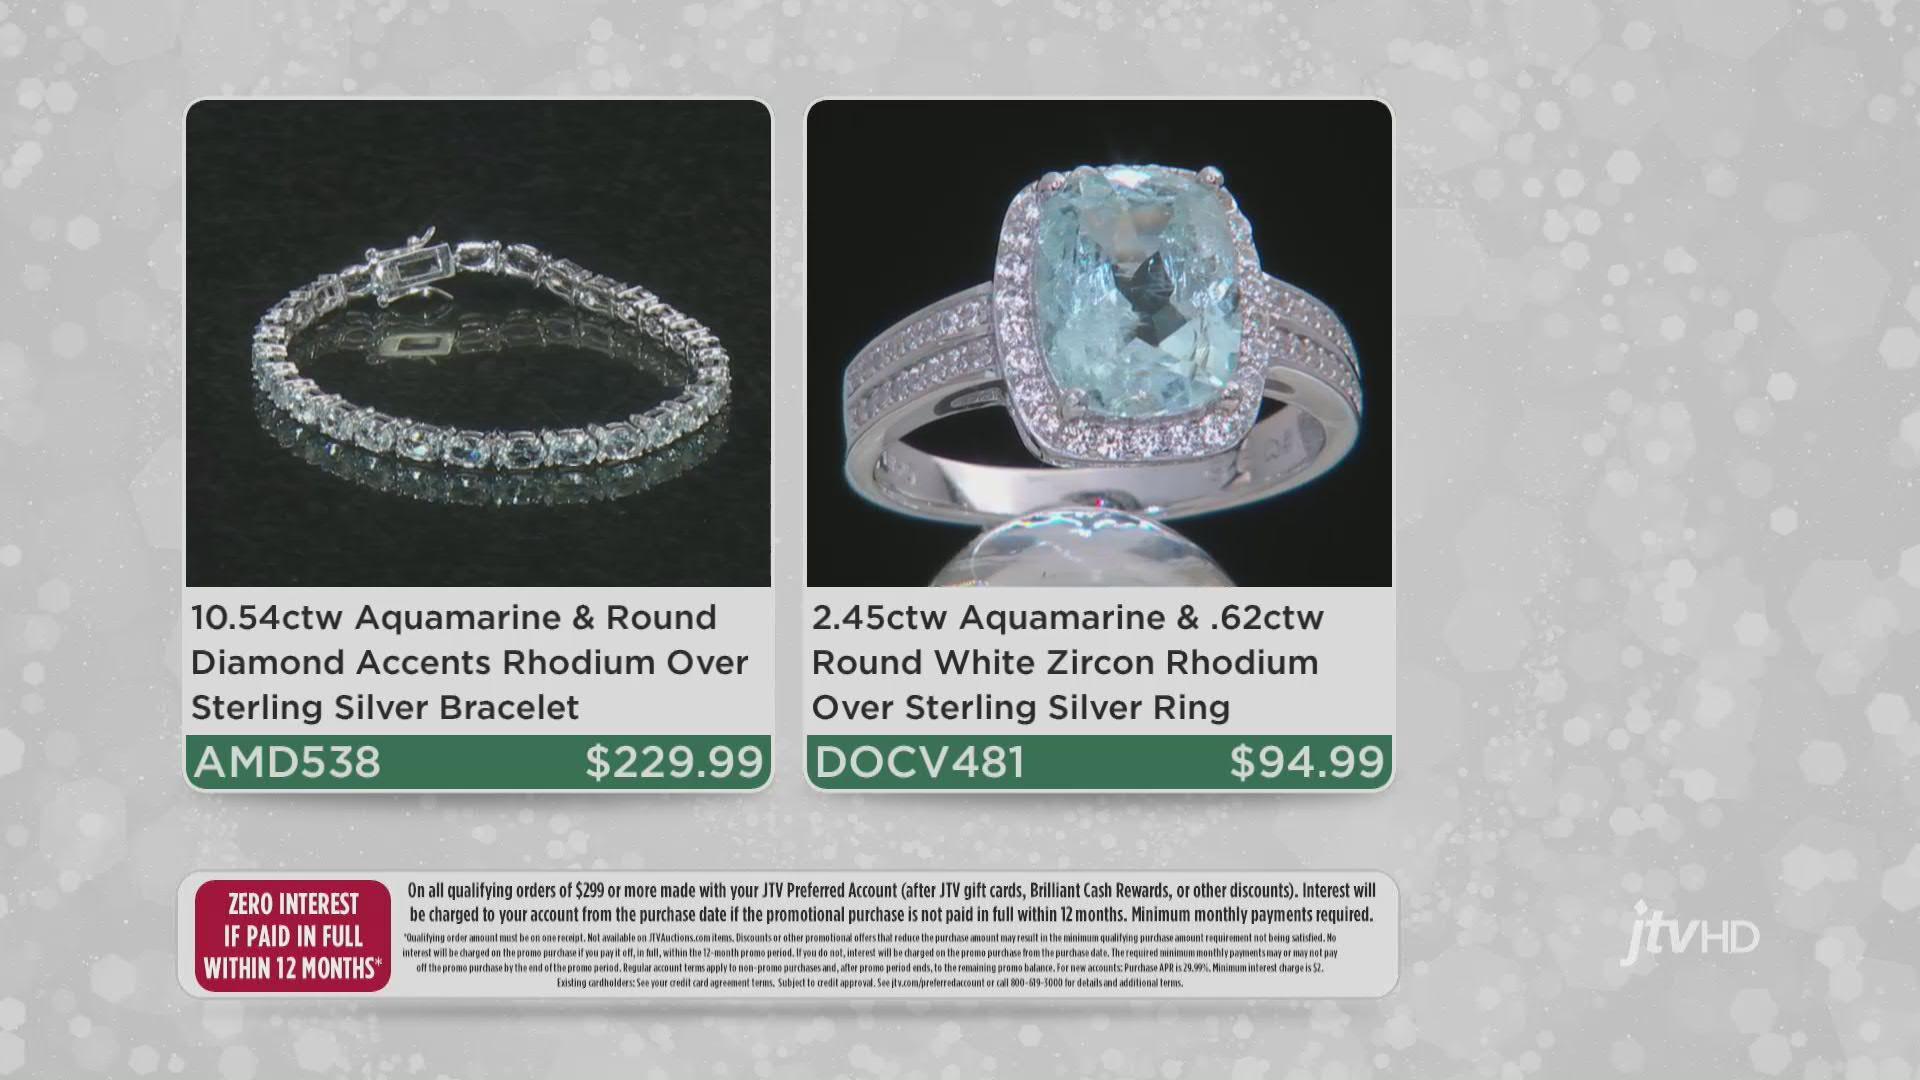 Blue Aquamarine Rhodium Over Sterling Silver Bracelet 10.57ctw